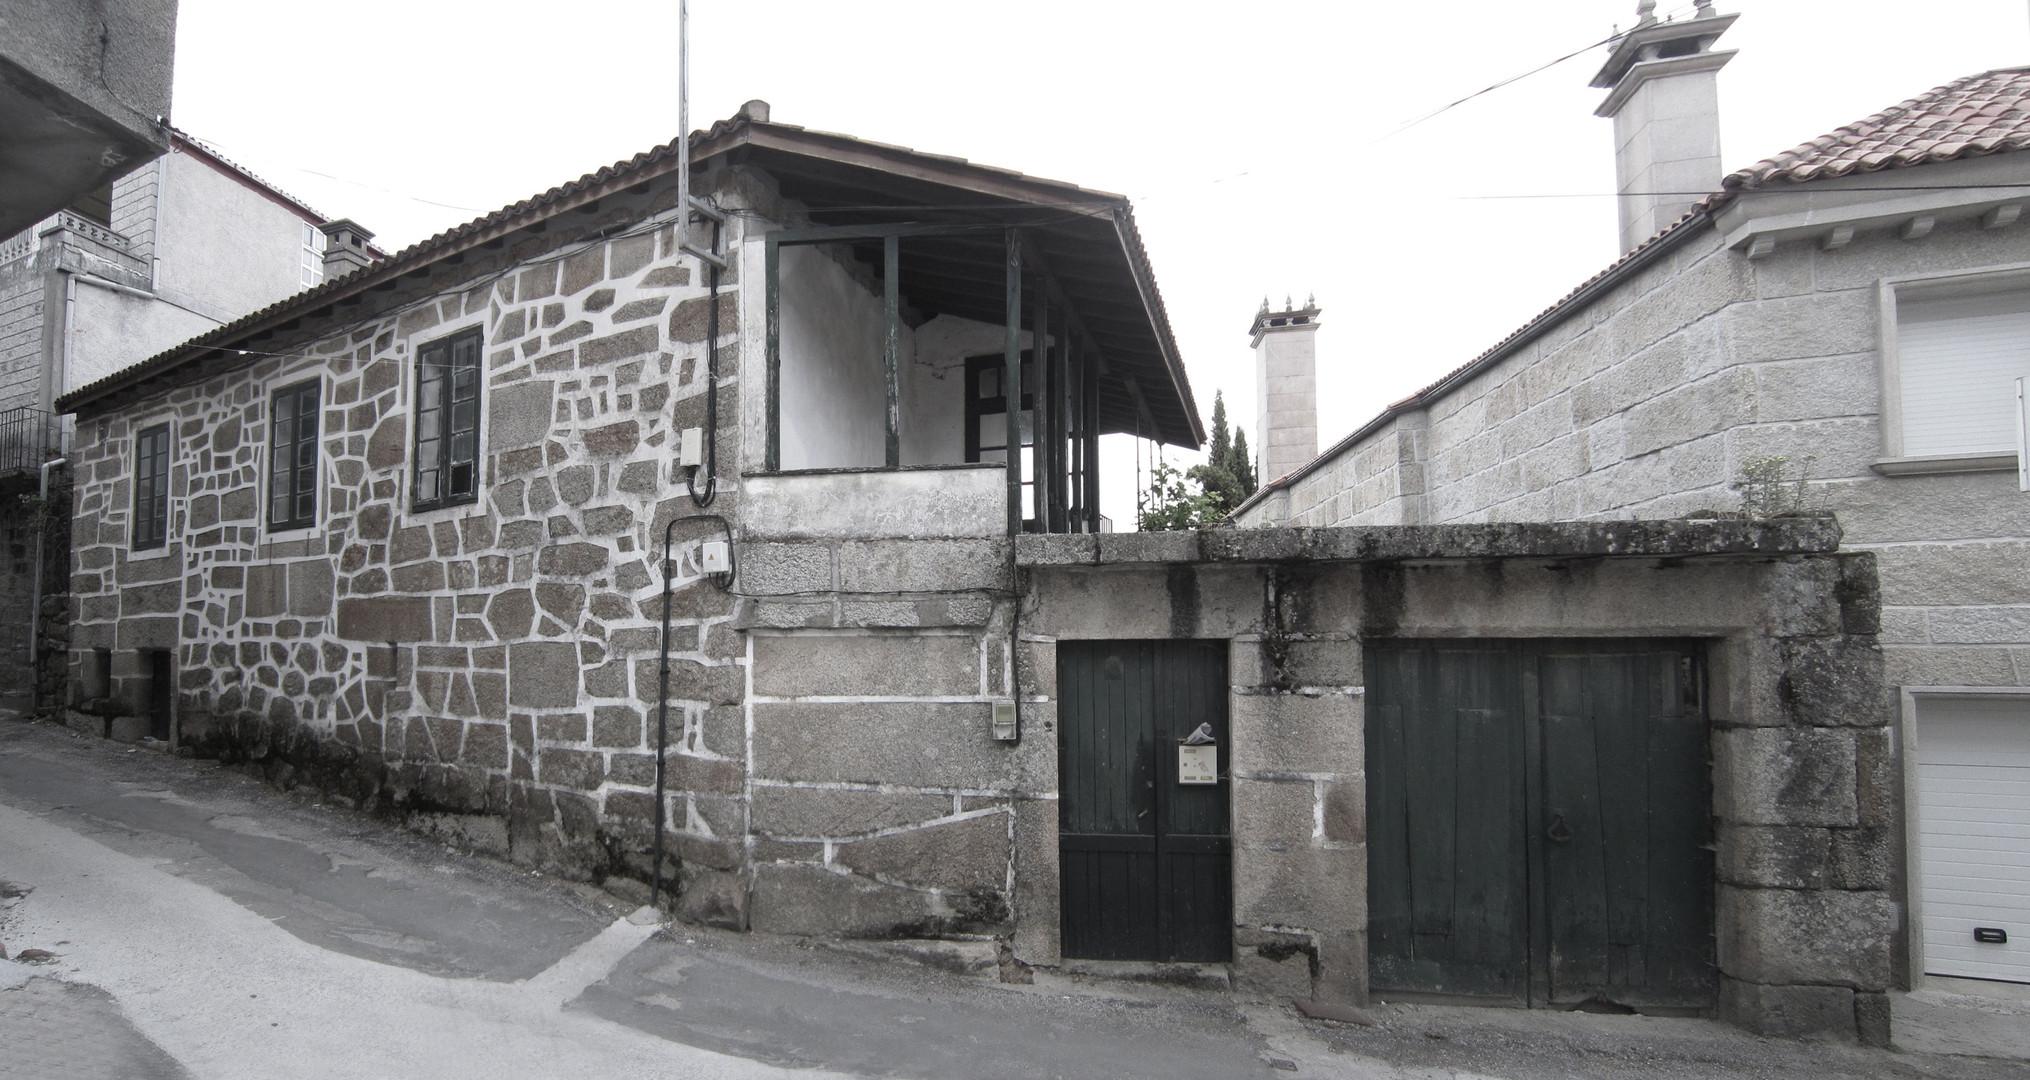 arquitectura-senmais-13.03.10.jpg